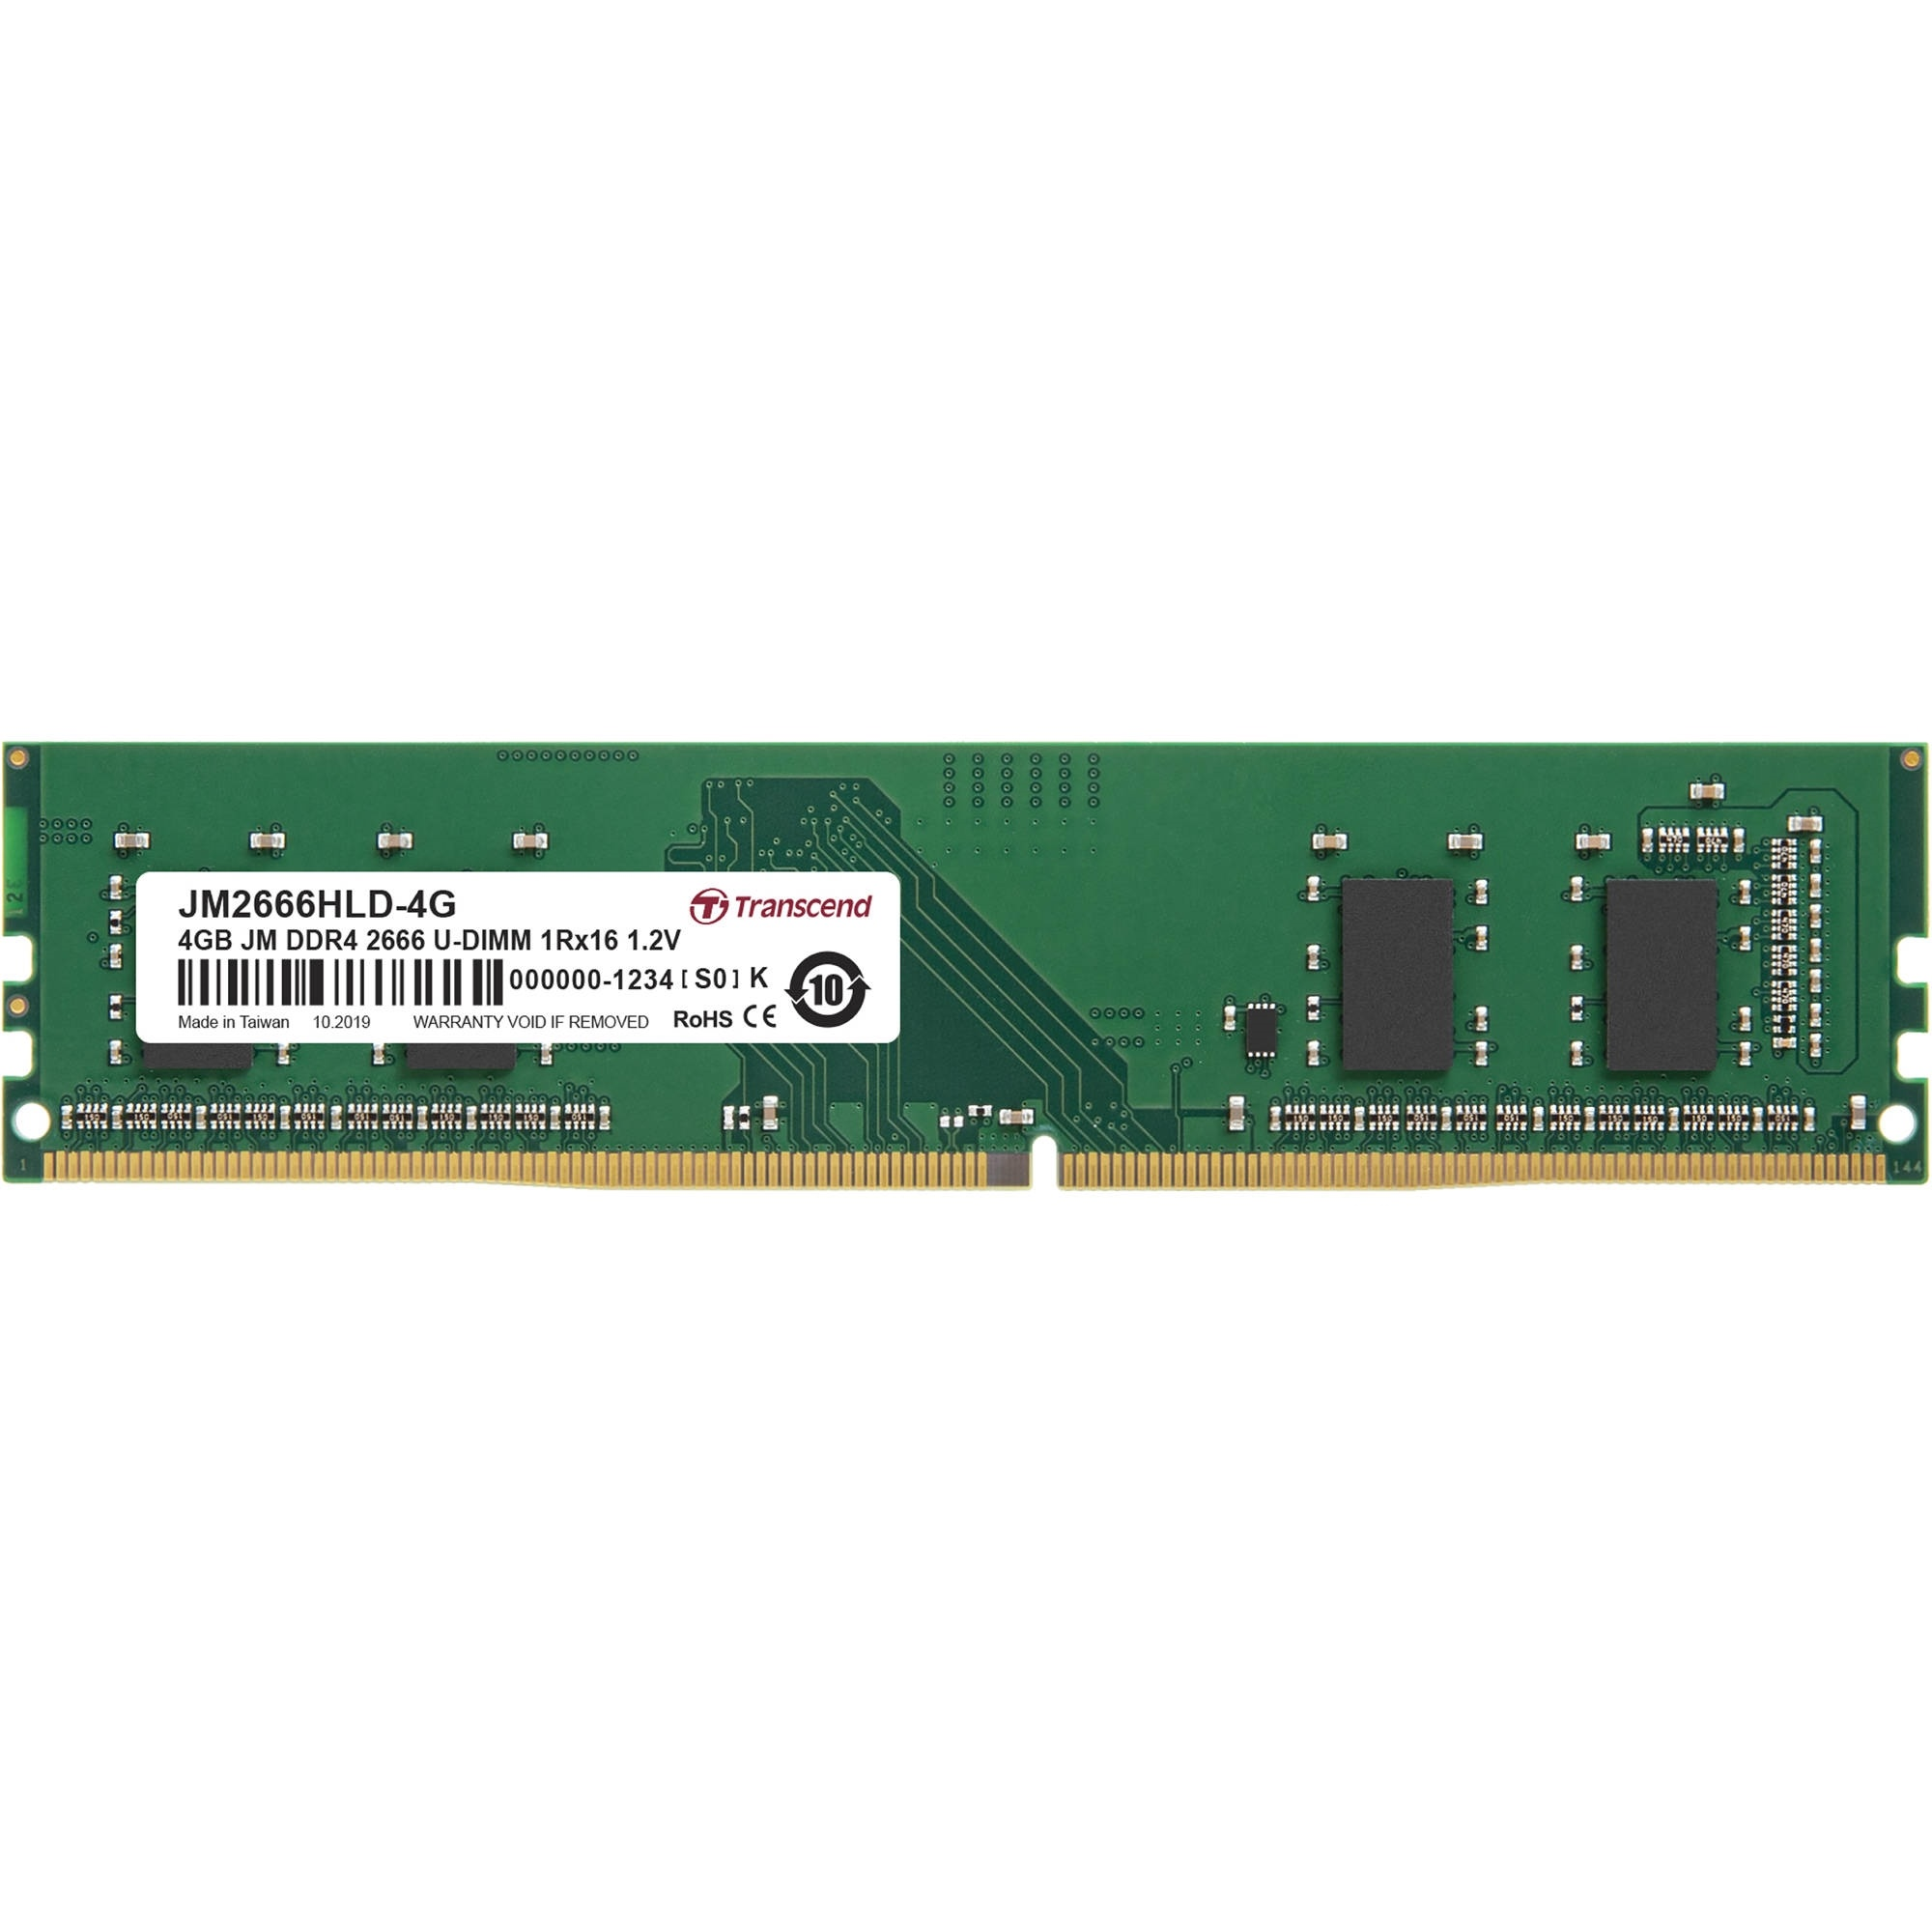 Transcend 4GB JetRam DDR4 2666 MHz CL19 UDIMM Memory Module (512Mx16 Chip)